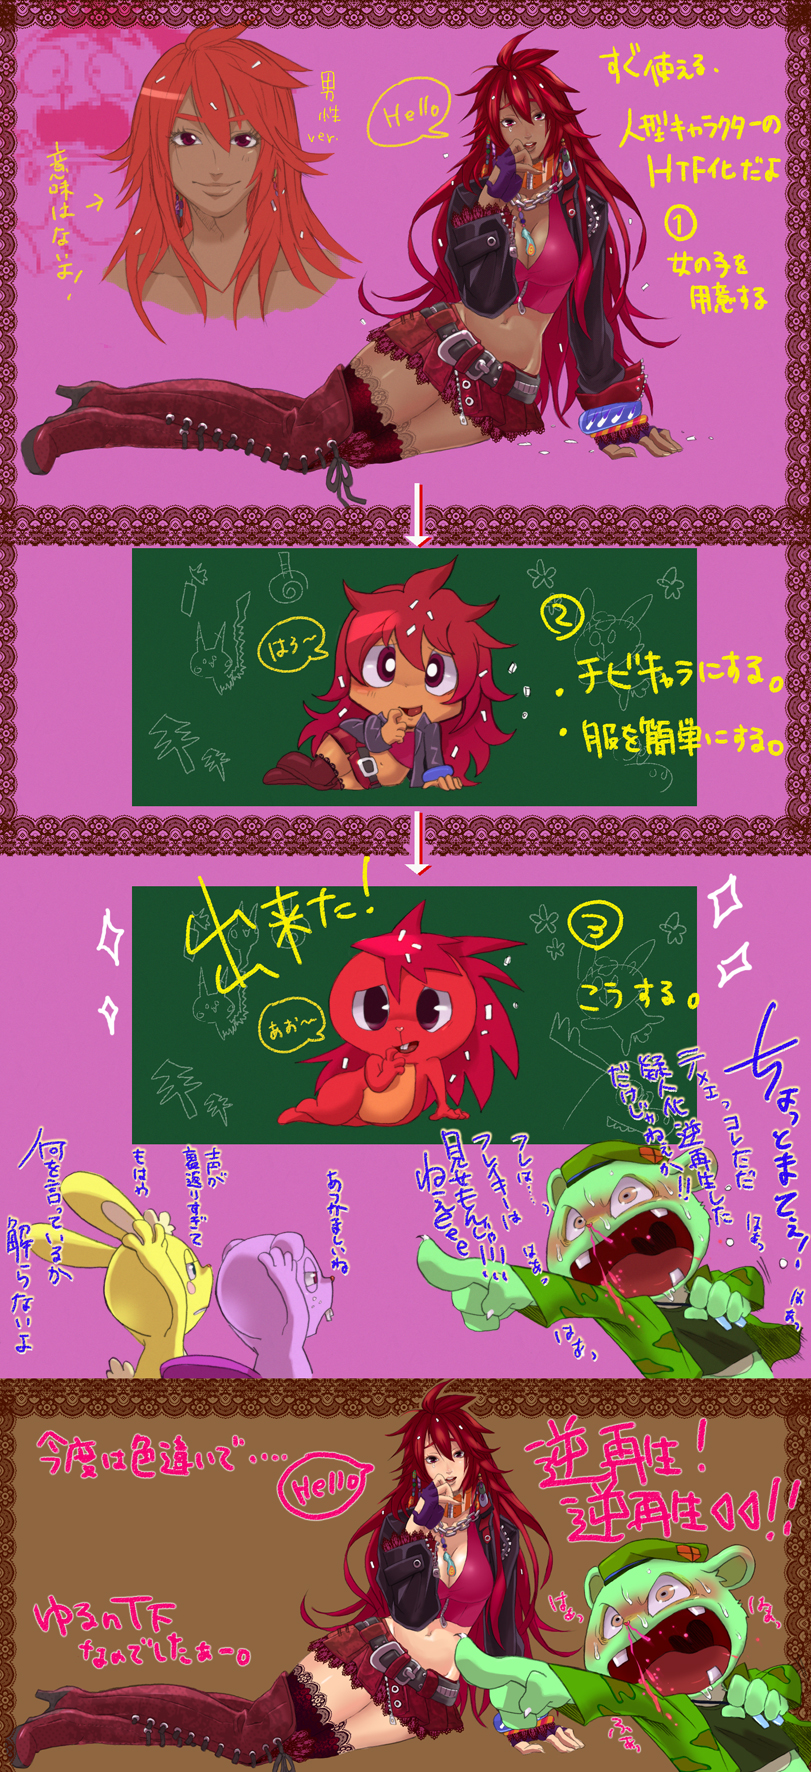 friends tree flaky happy anime Witcher 3 iris von everec